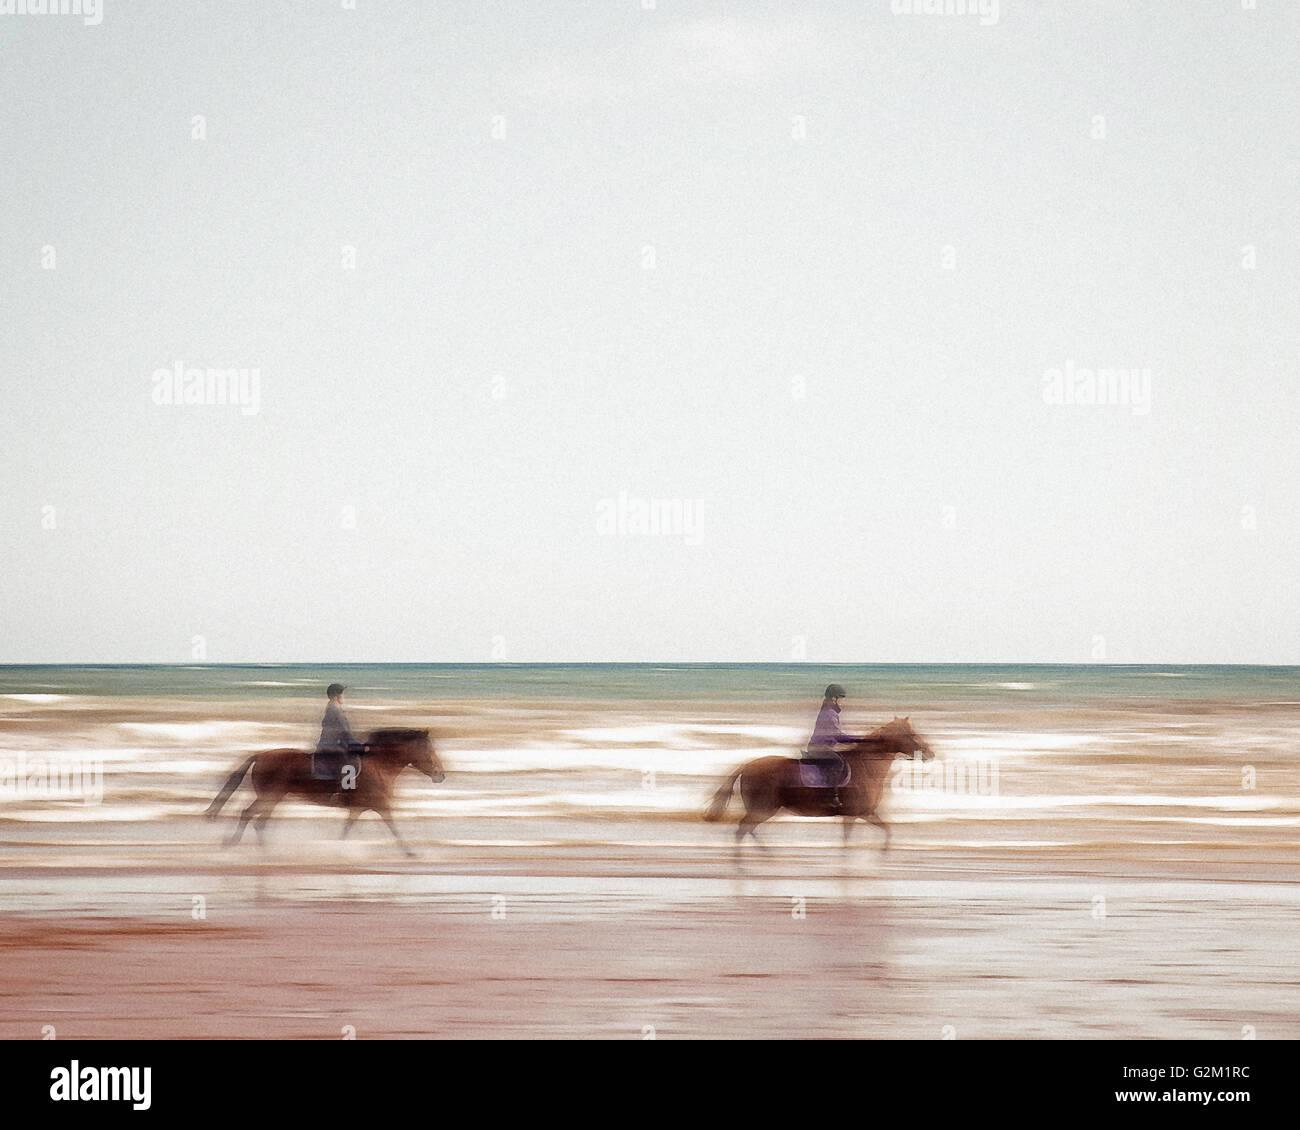 DIGITAL ART: Riding the Tide - Stock Image